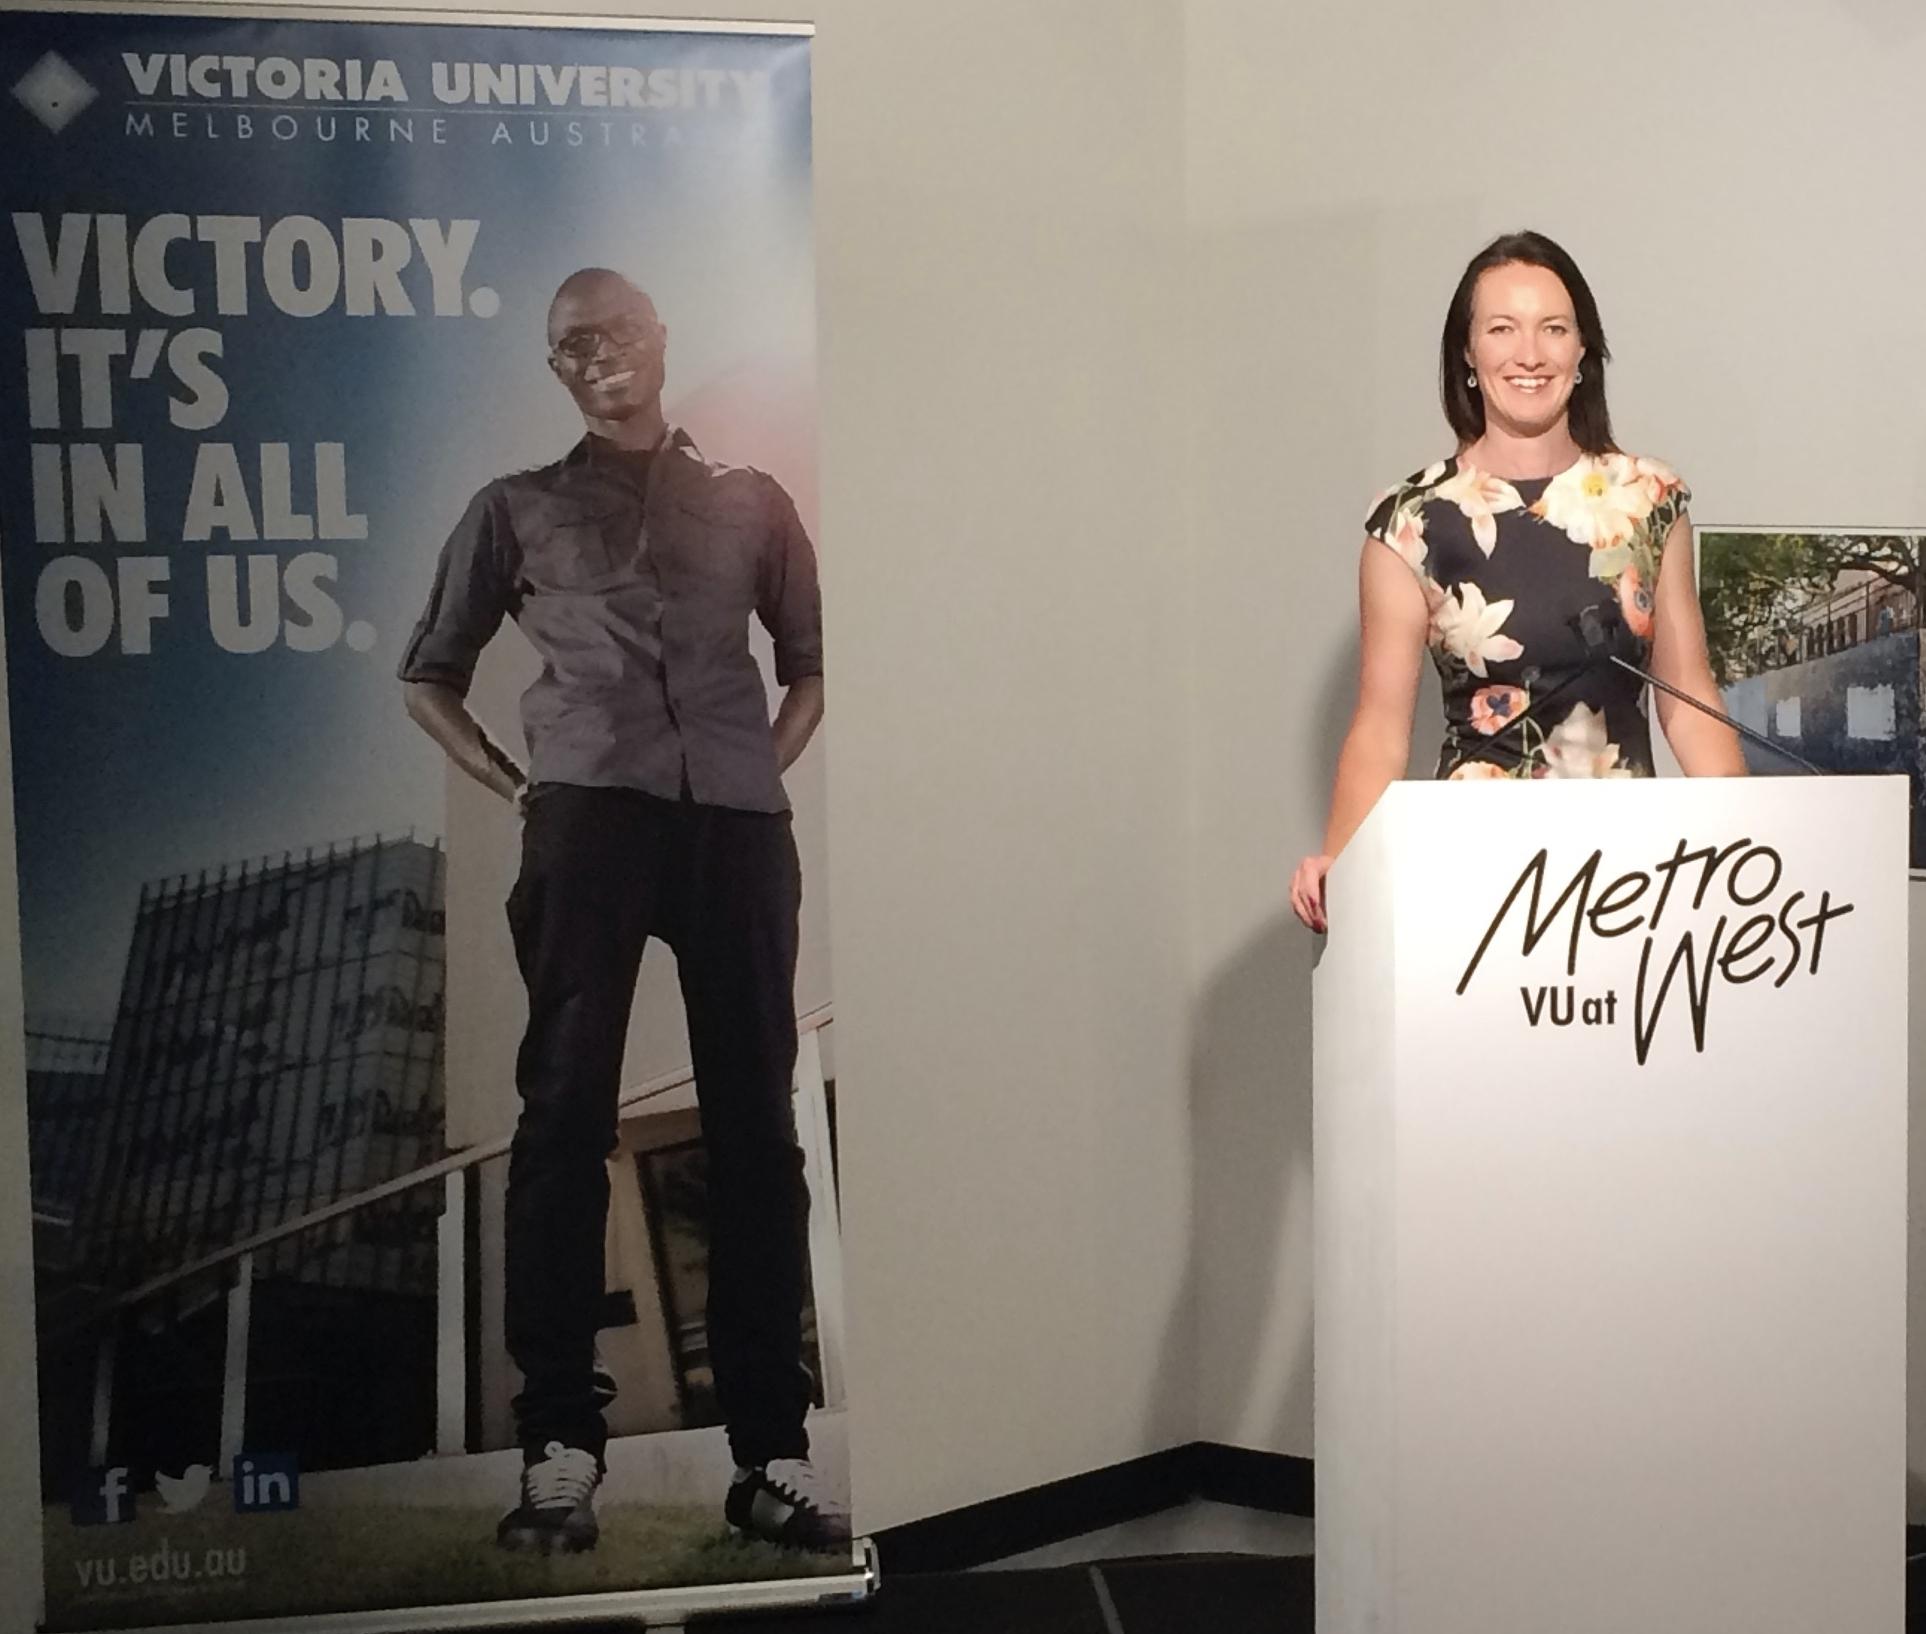 Delivering the inaugural Dean's Lecture at Victoria University, Australia